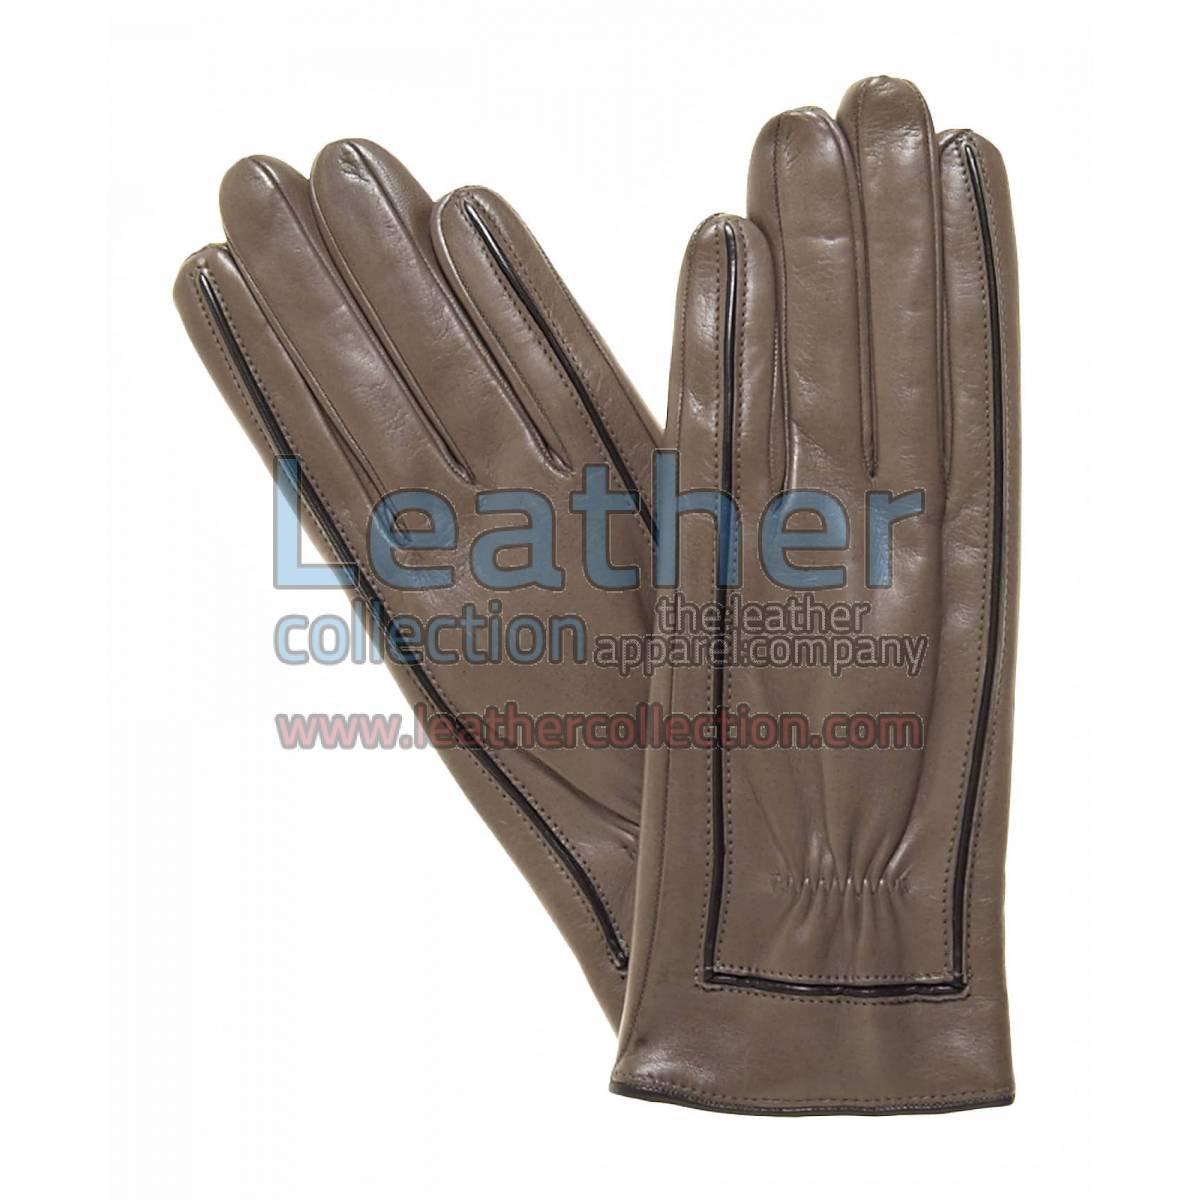 Decorative Stitching Ladies Brown Leather Gloves